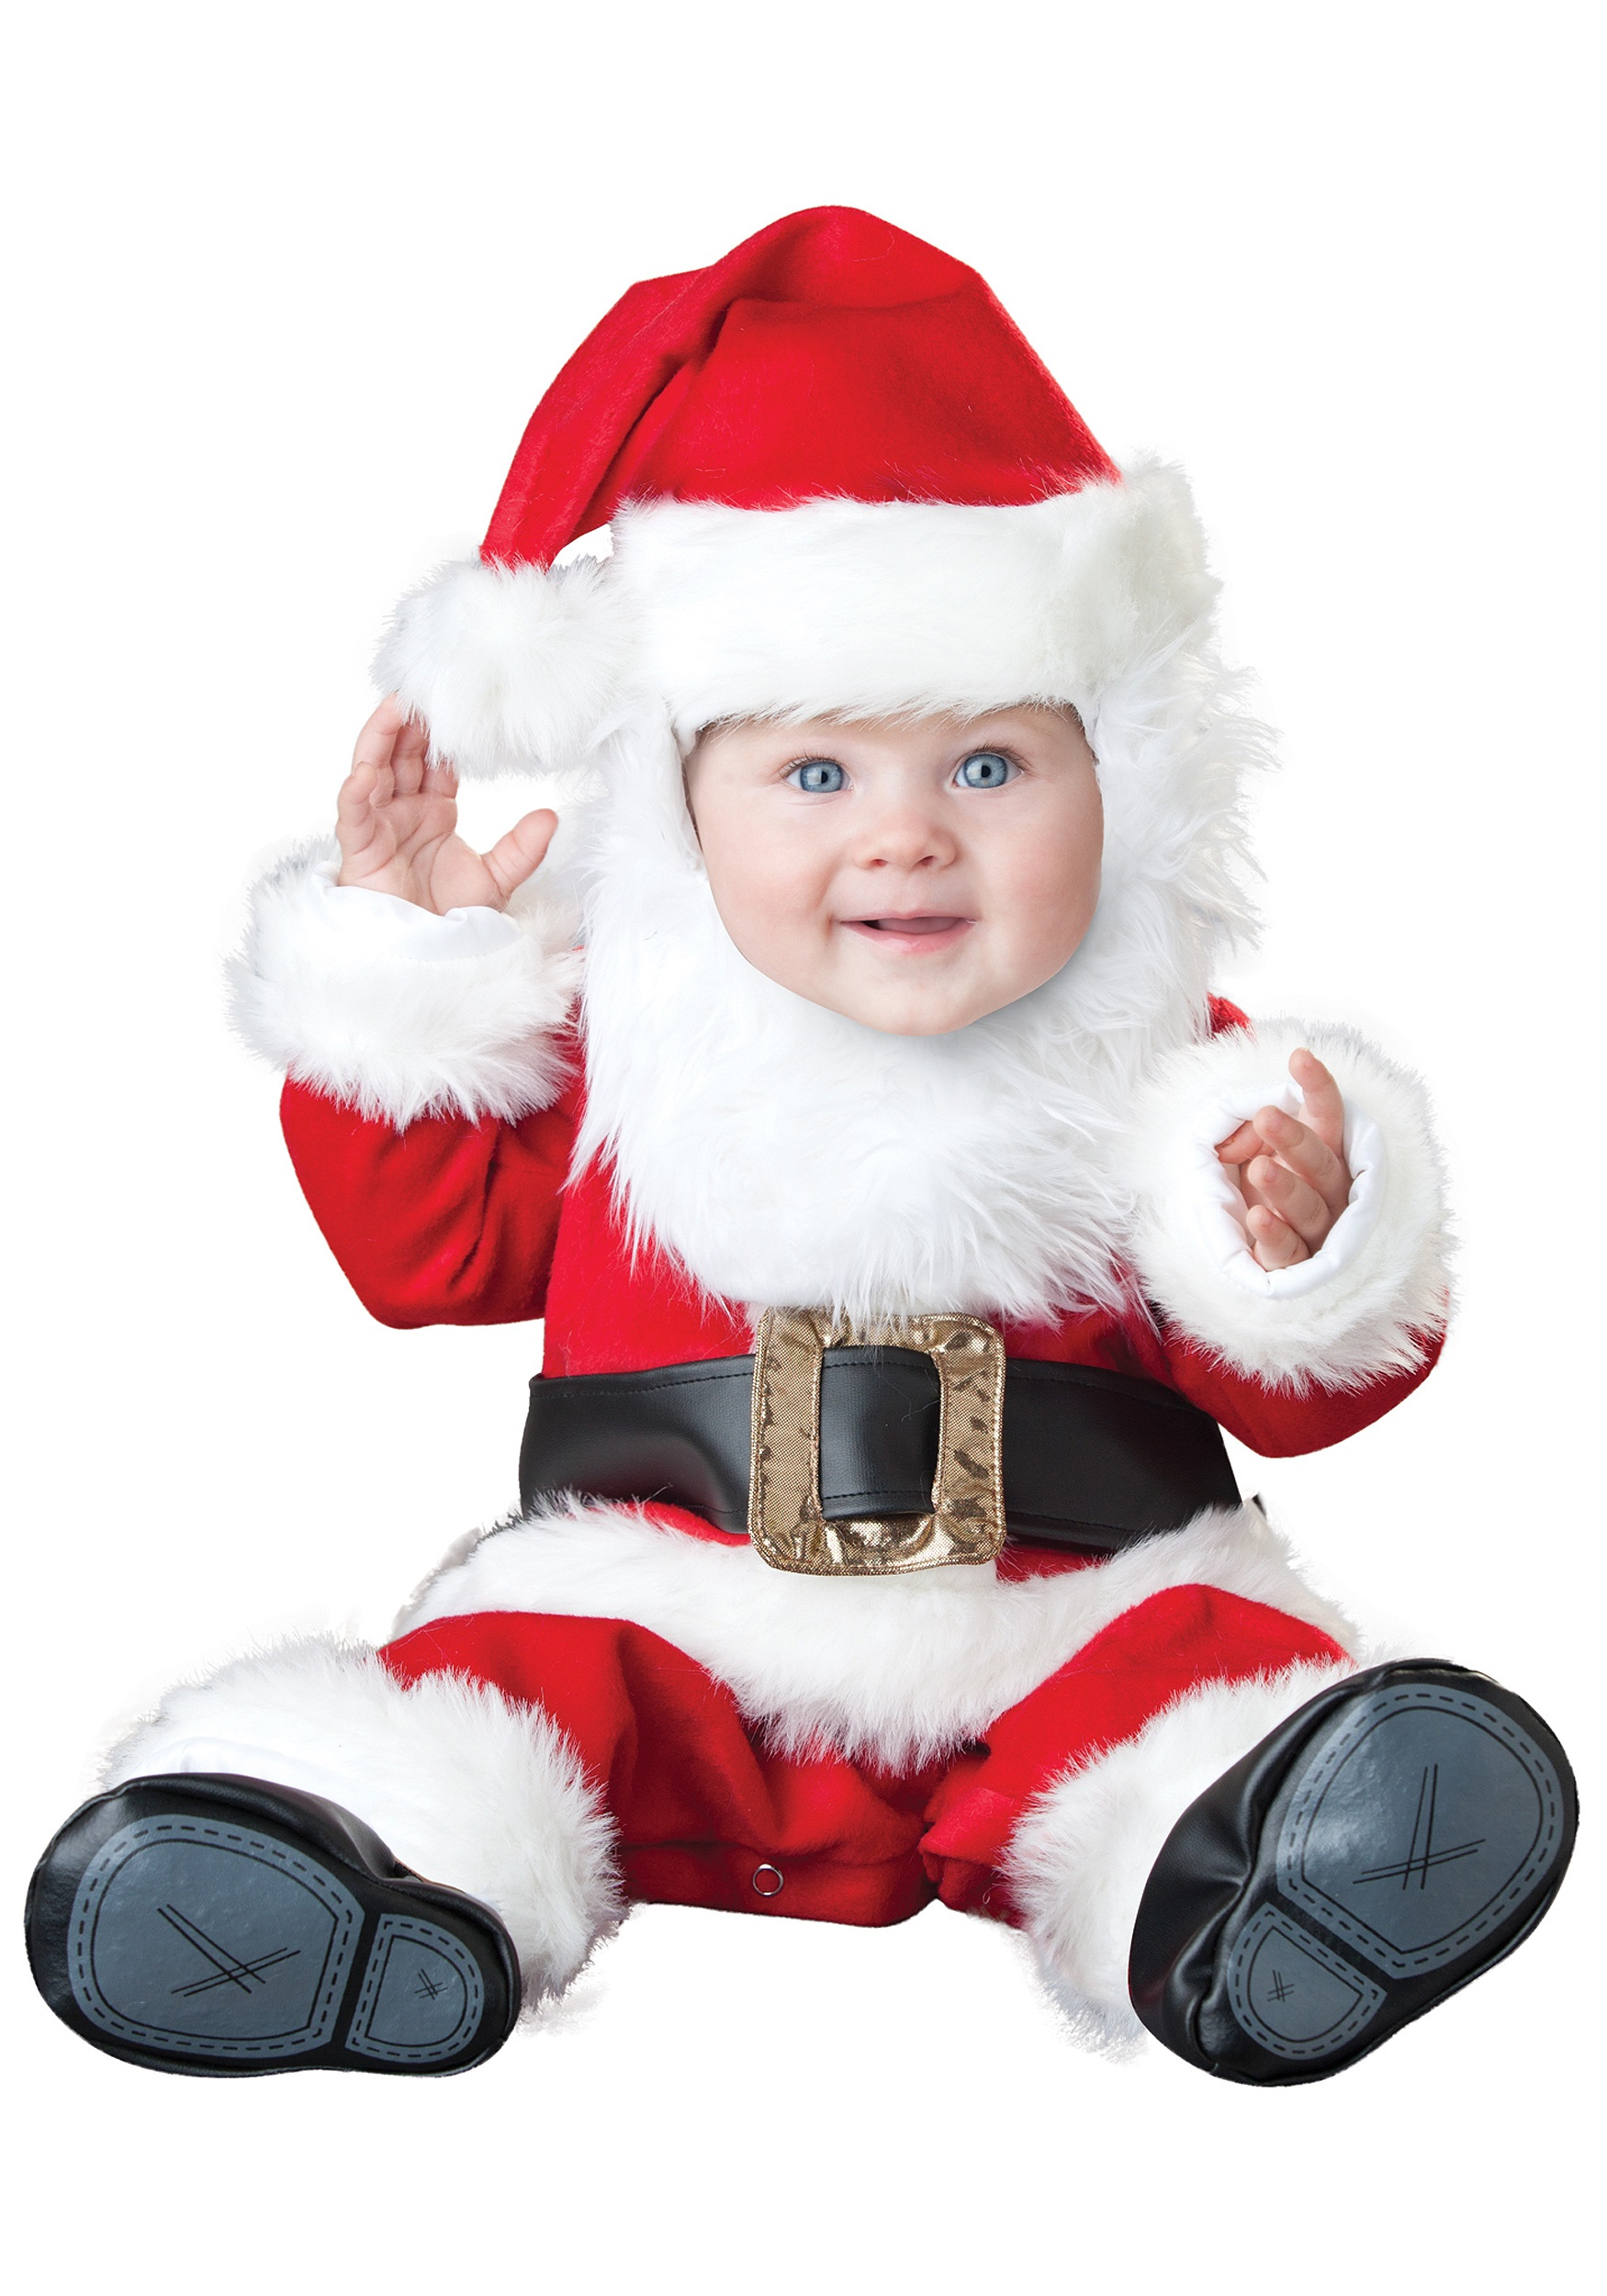 Baby Santa Costume  sc 1 st  Halloween Costume & Baby Santa Costume - Festive Santa Claus Costumes for Babies